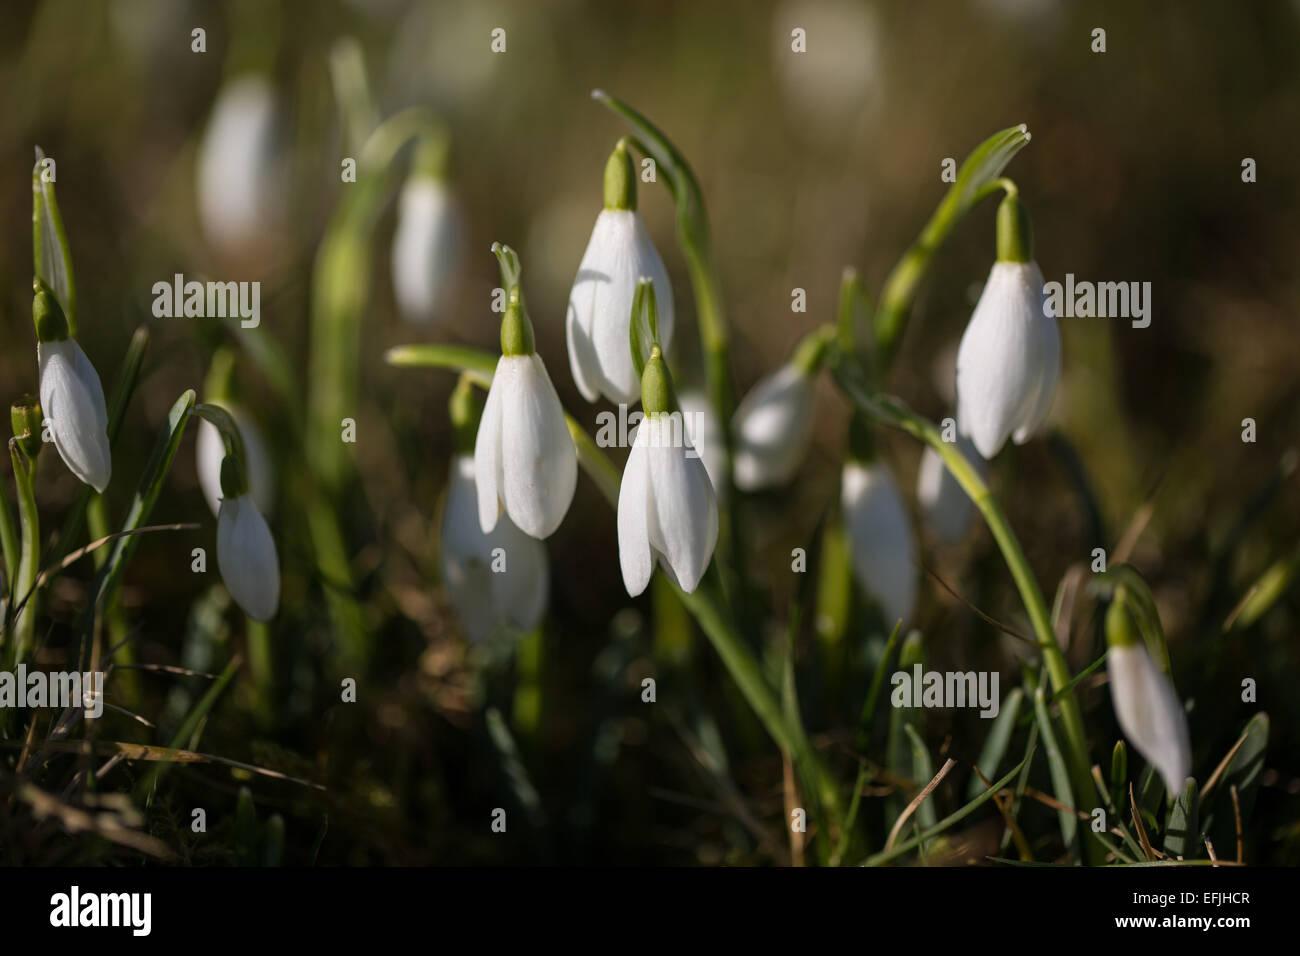 Close-up of snowdrop - Galanthus - at Kerry churchyard, Powys. - Stock Image